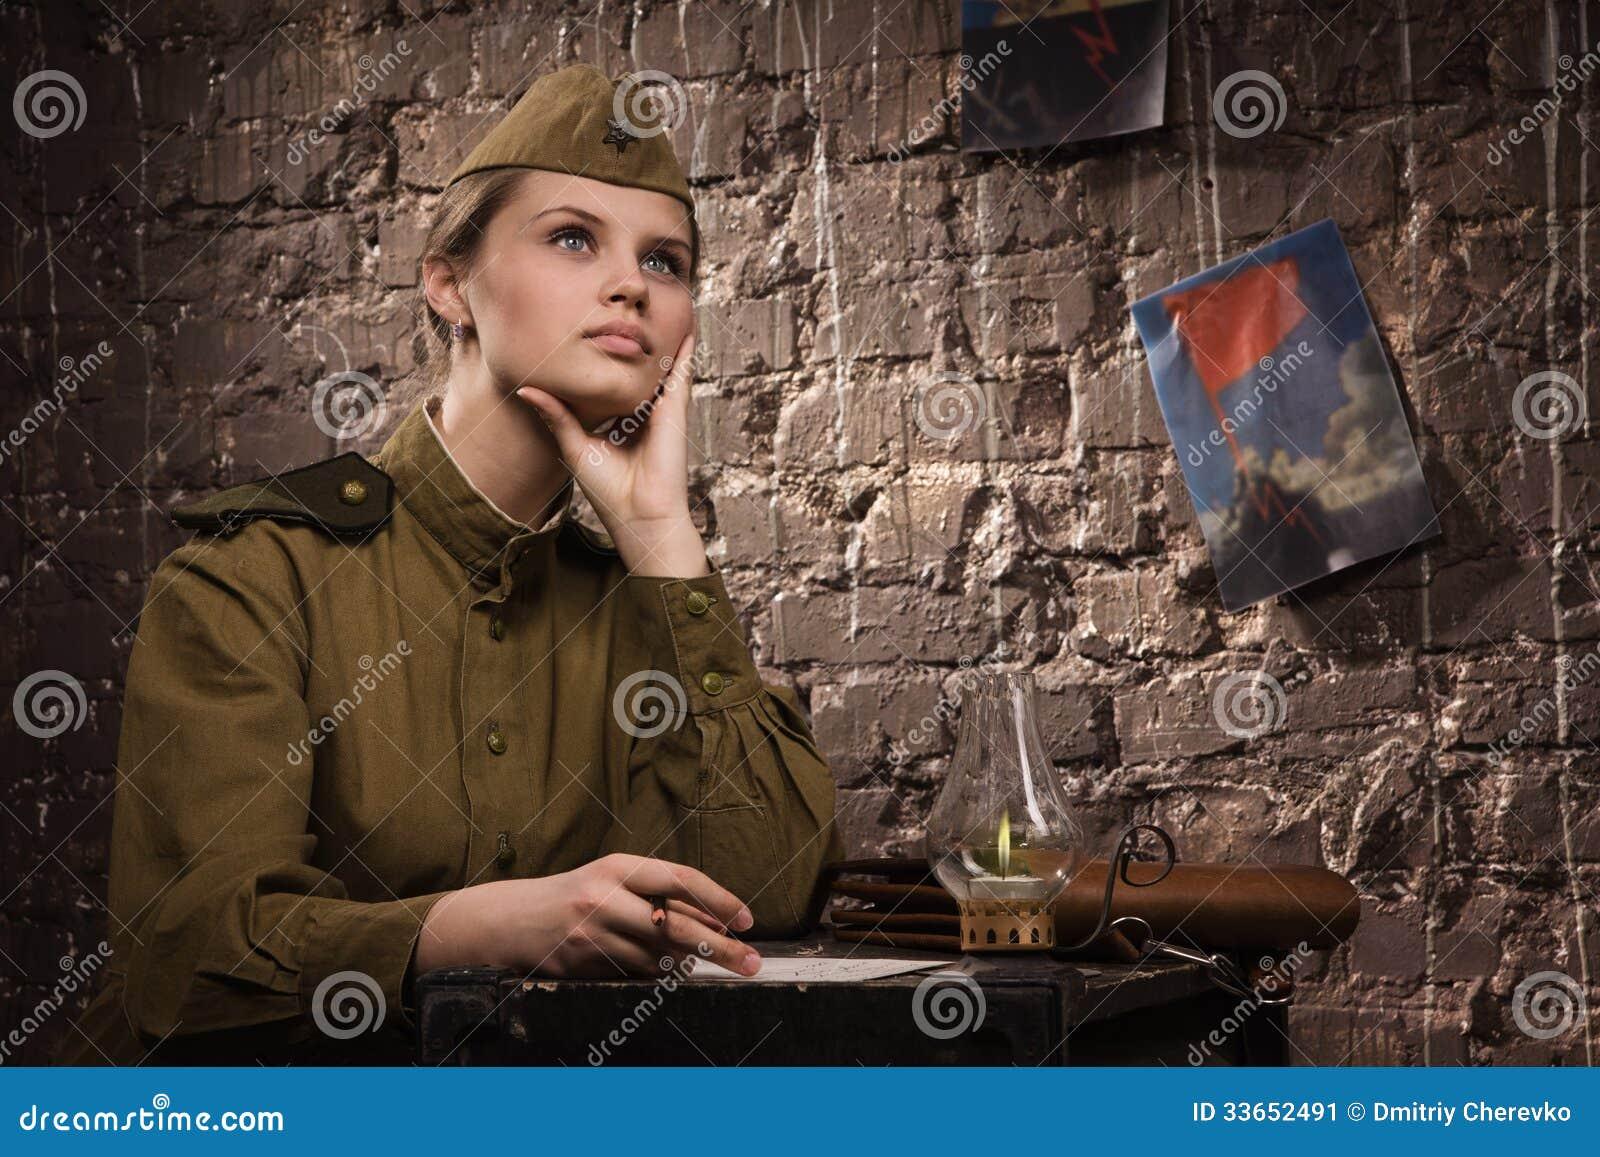 Polish female soldiers.part 2 | Go Polish Army. | Pinterest ...